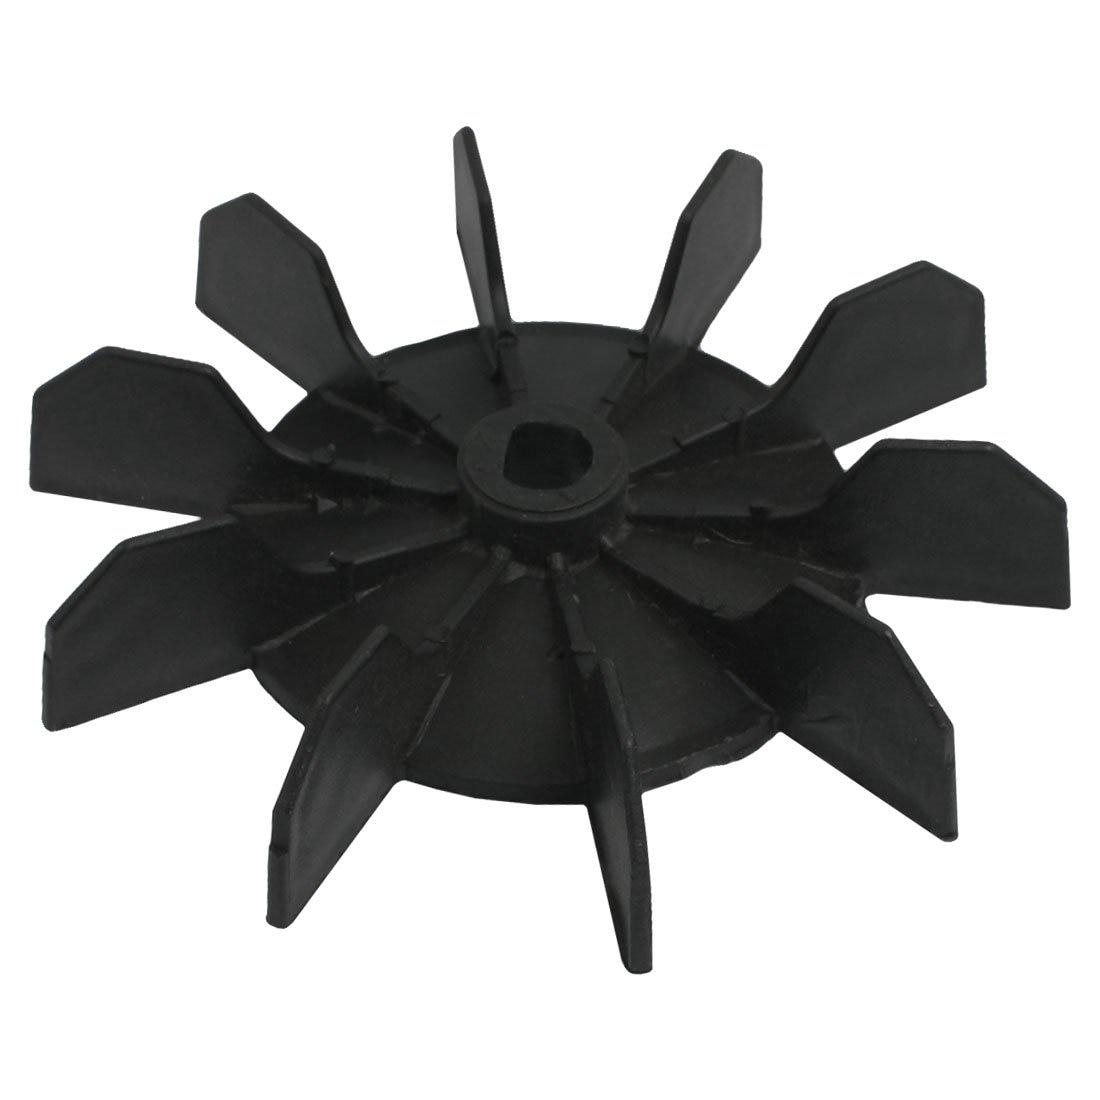 Replacement Air Compressor Part 12mm Inner Dia 10 Impeller Air Compressor Motor Fan Blade Black